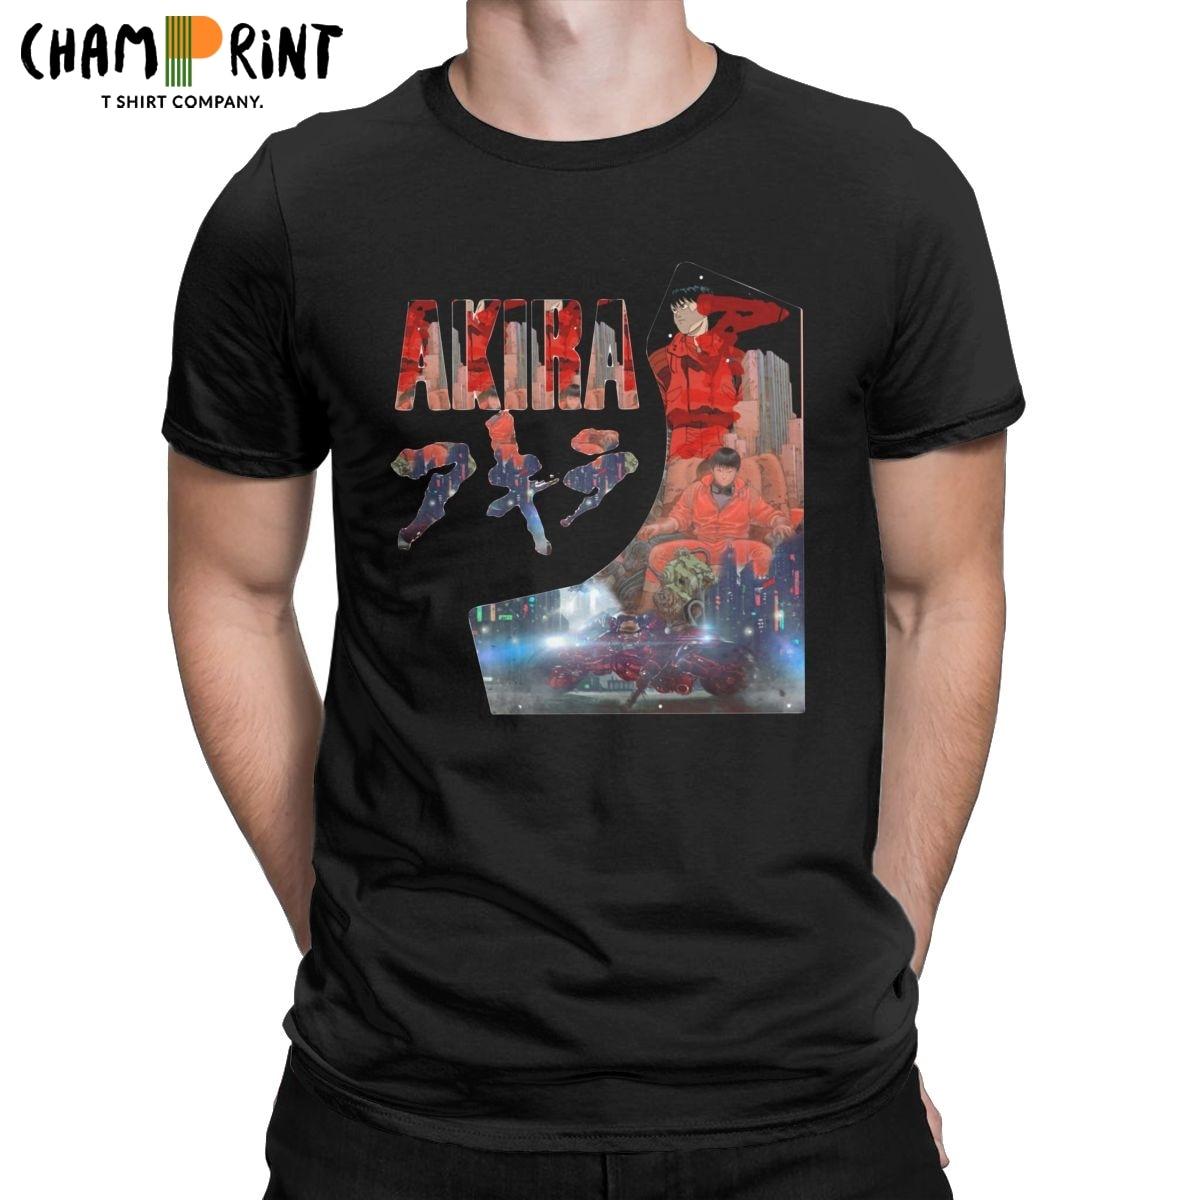 Camiseta de Anime de la película Akira para hombre, camisa de Kaneda...